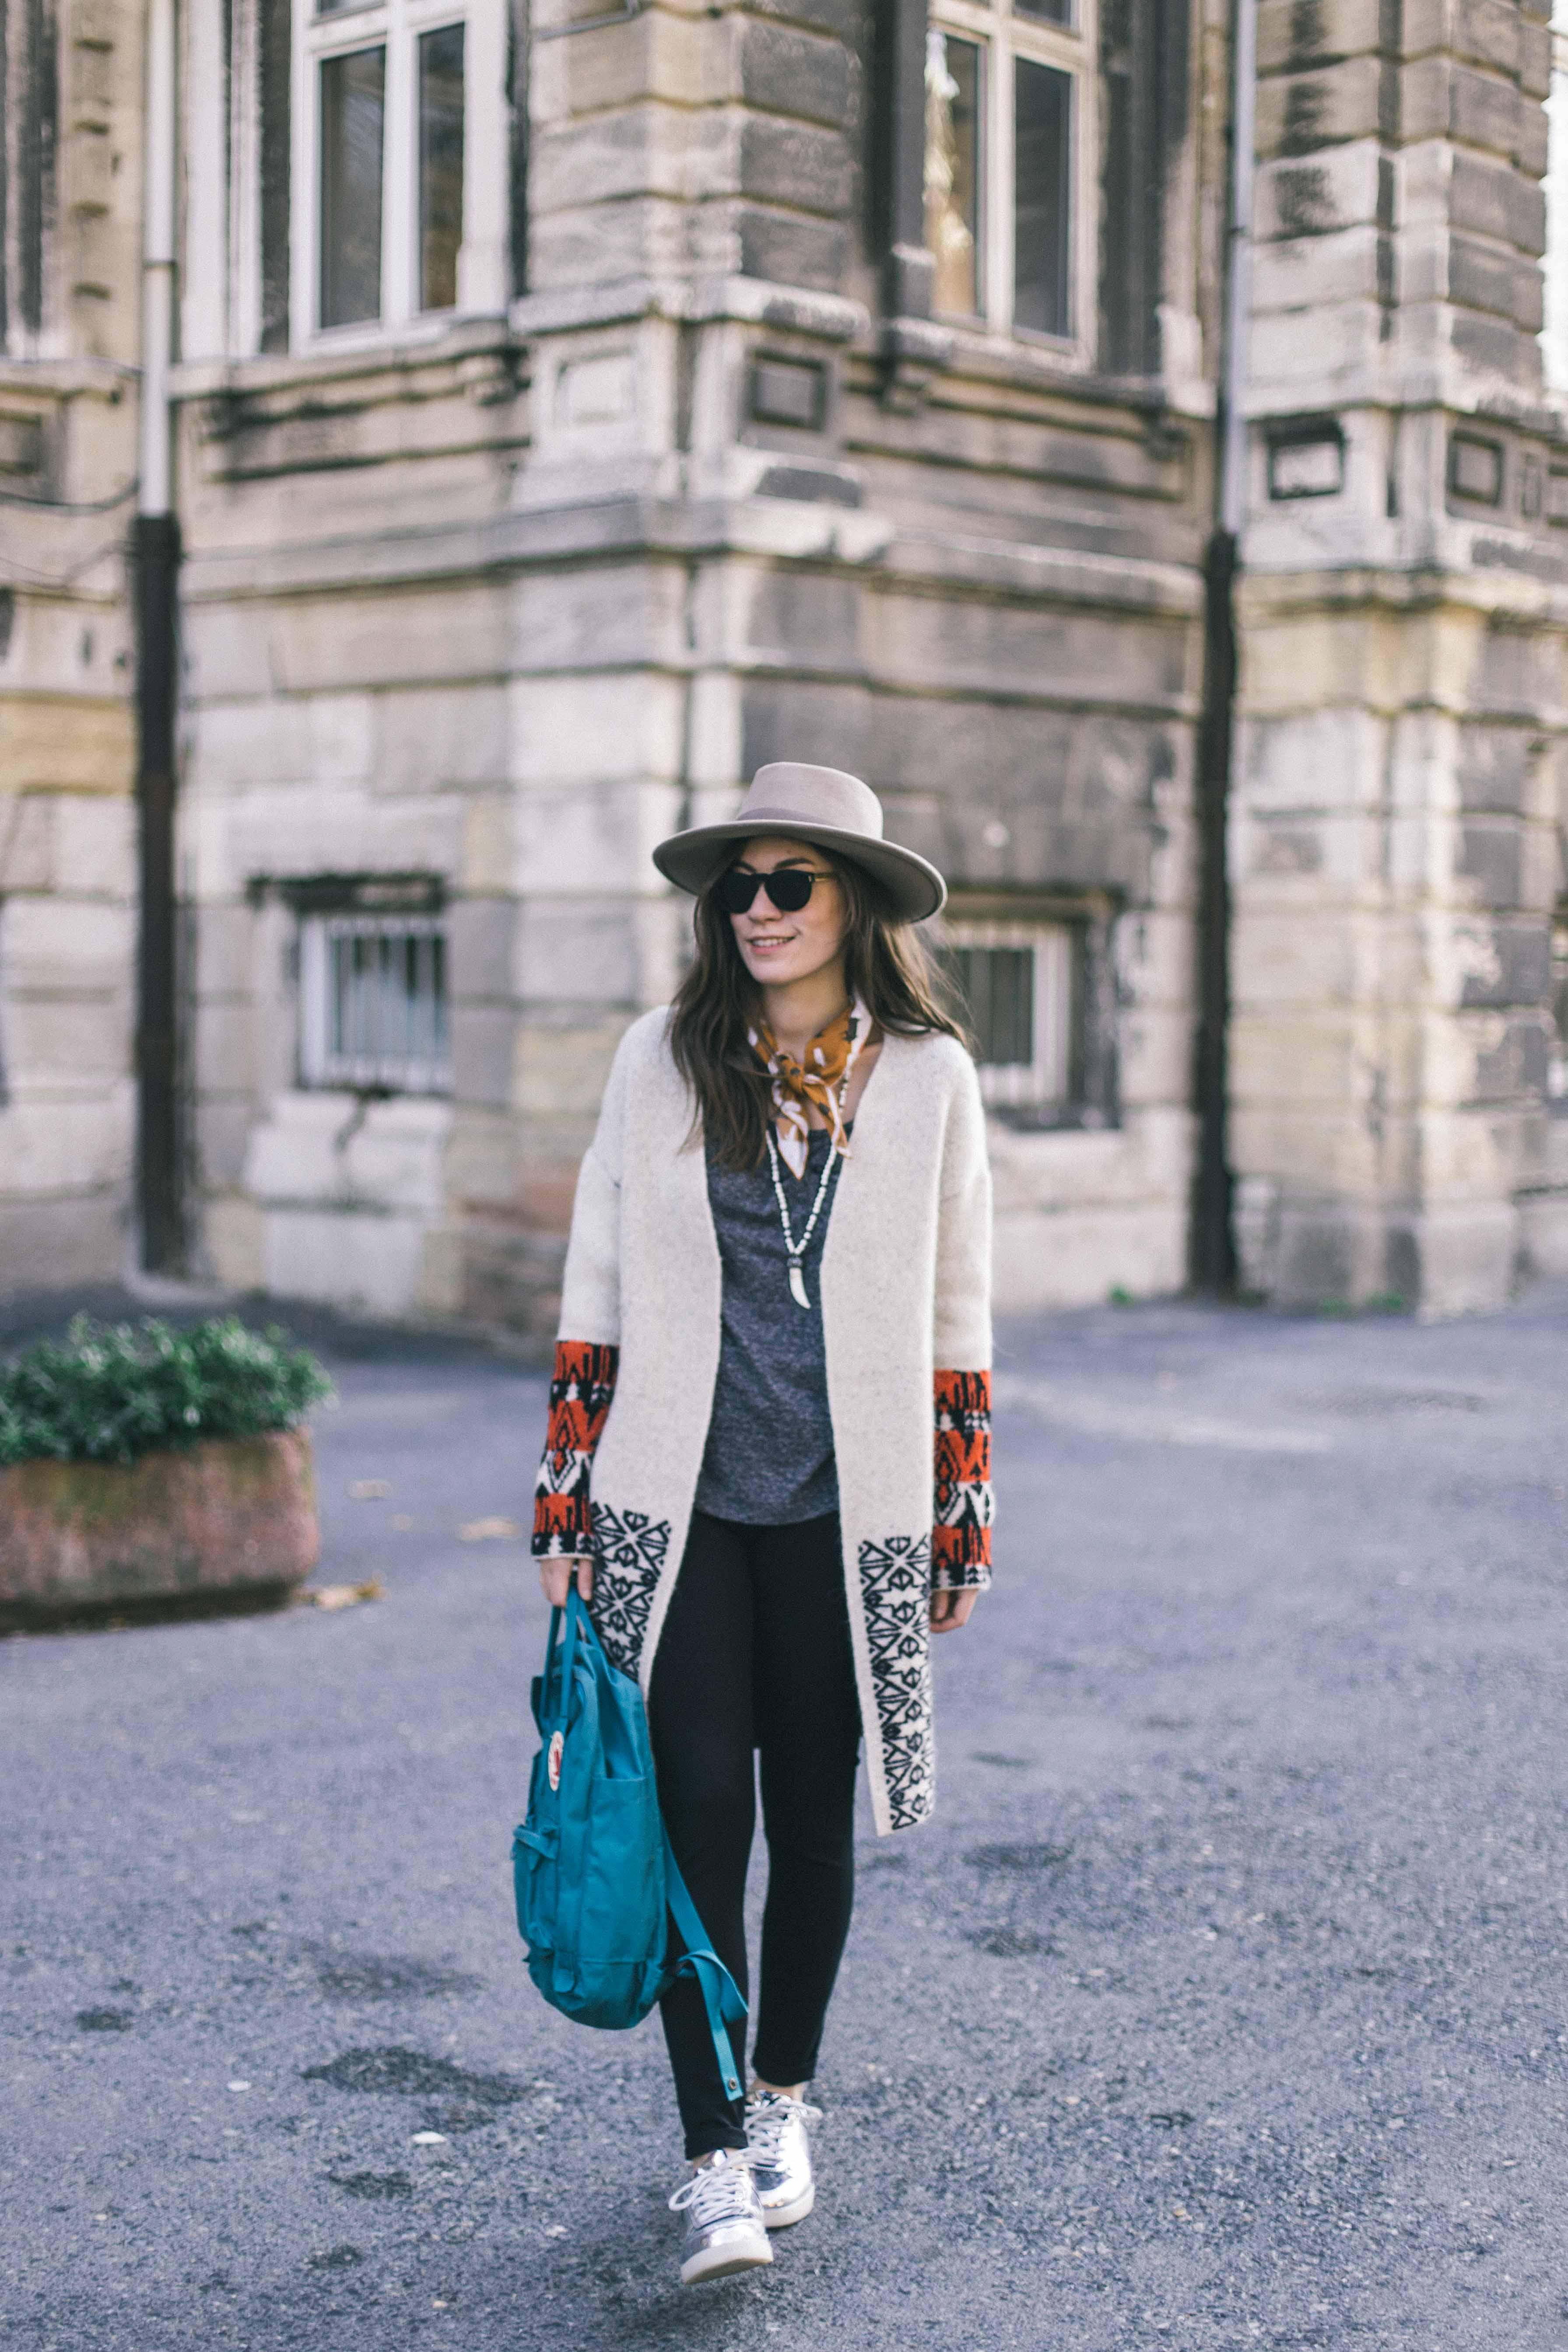 billur saatci, offnegiysem, turkish style blogger, street style, fashion, ootd, blogger, istanbul, mavi, mavi jeans, parka, panama hat, vintage hat, boho, bohemian style